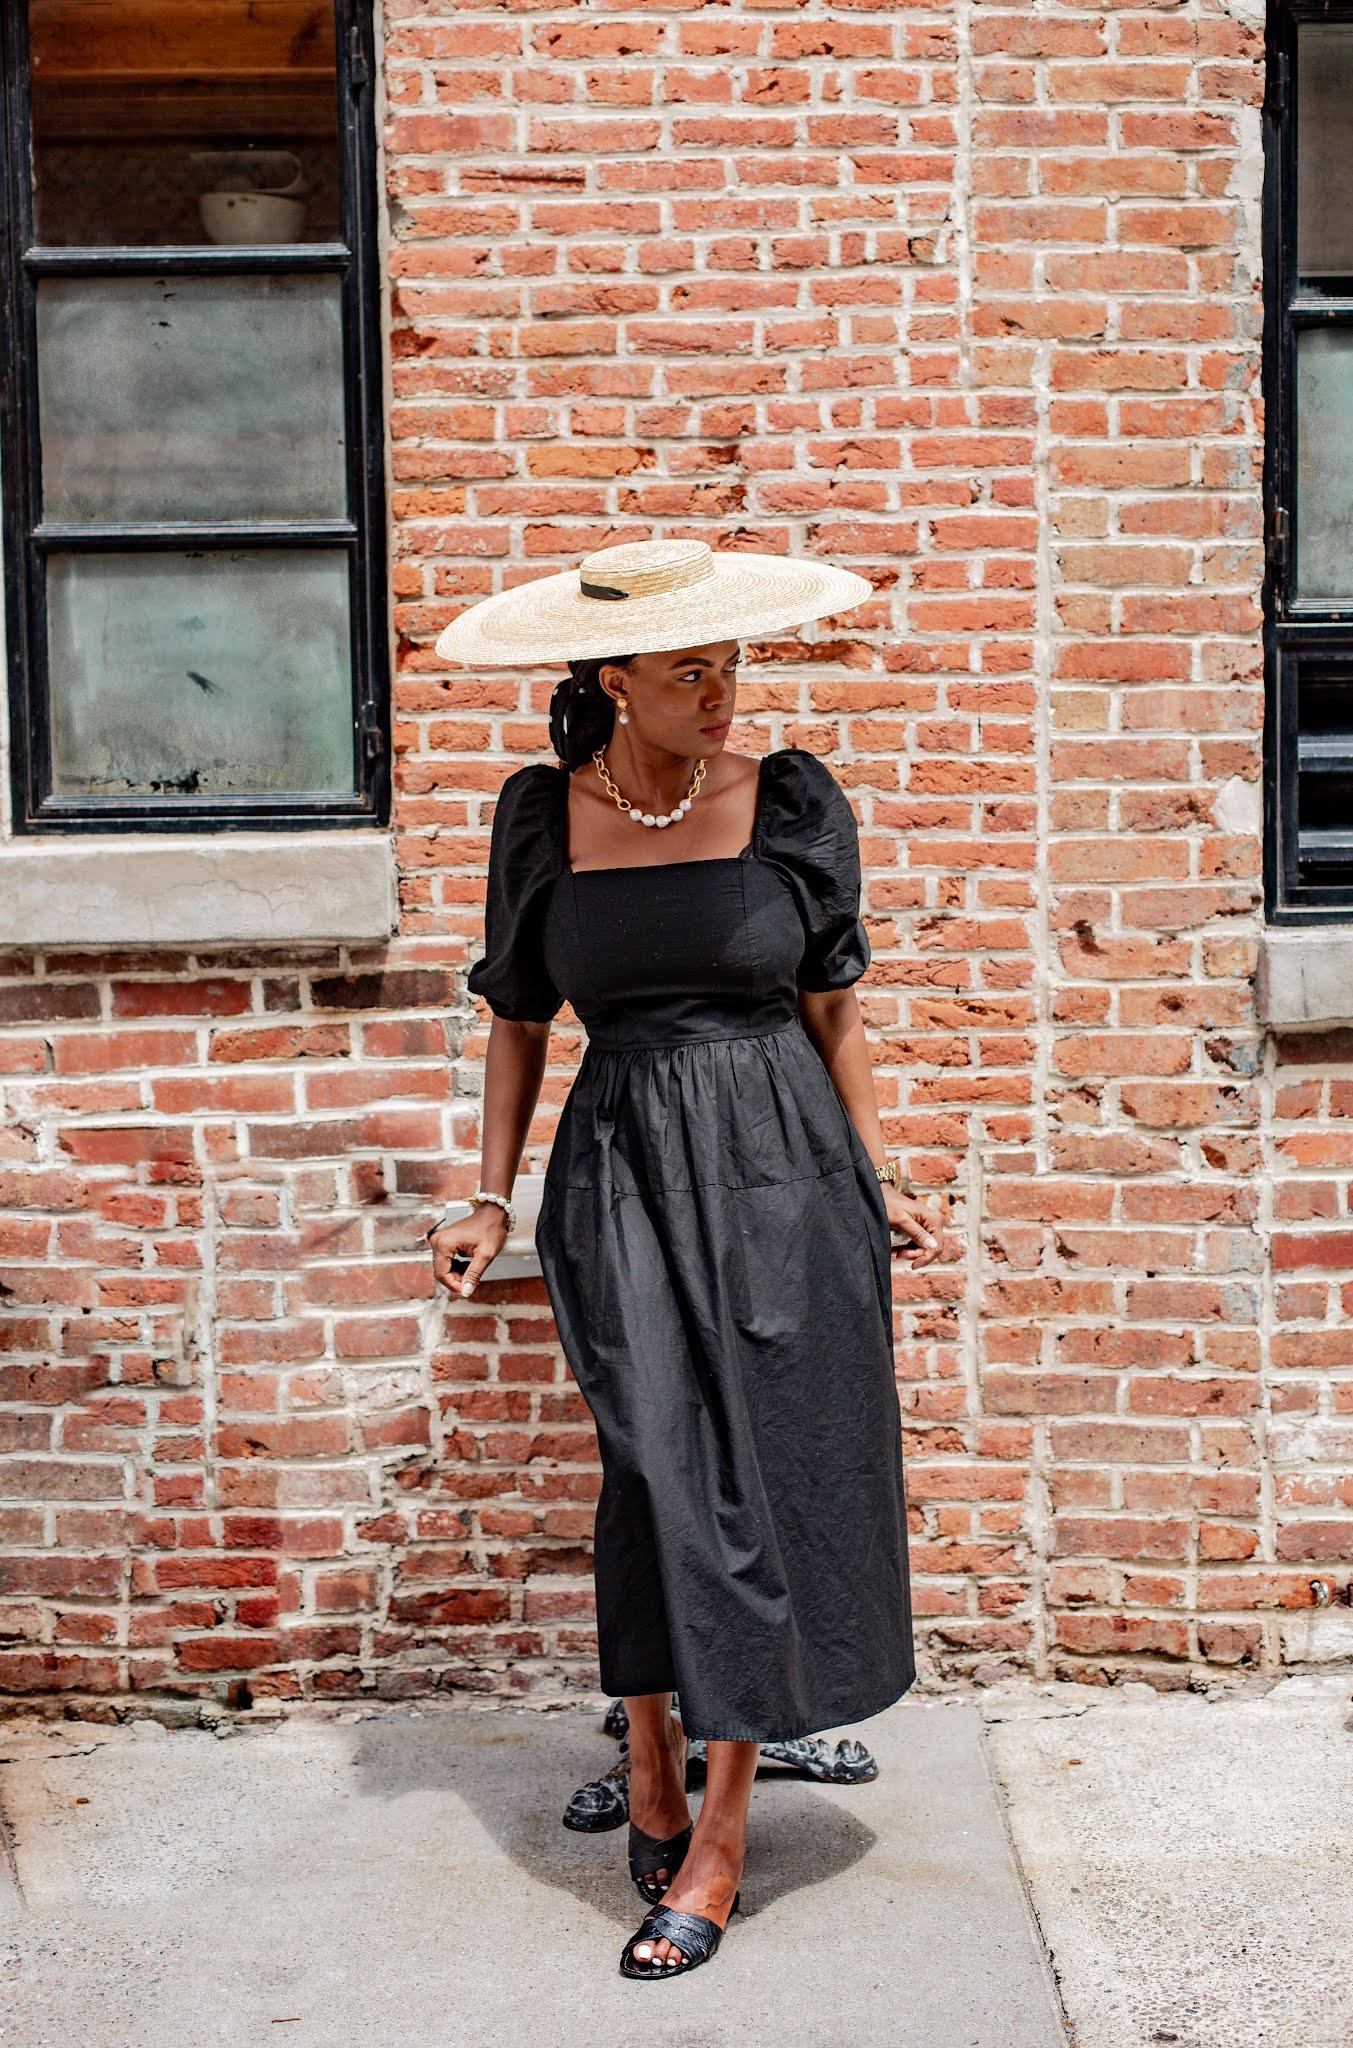 BEST Photo Spots in New York : TRIBECA